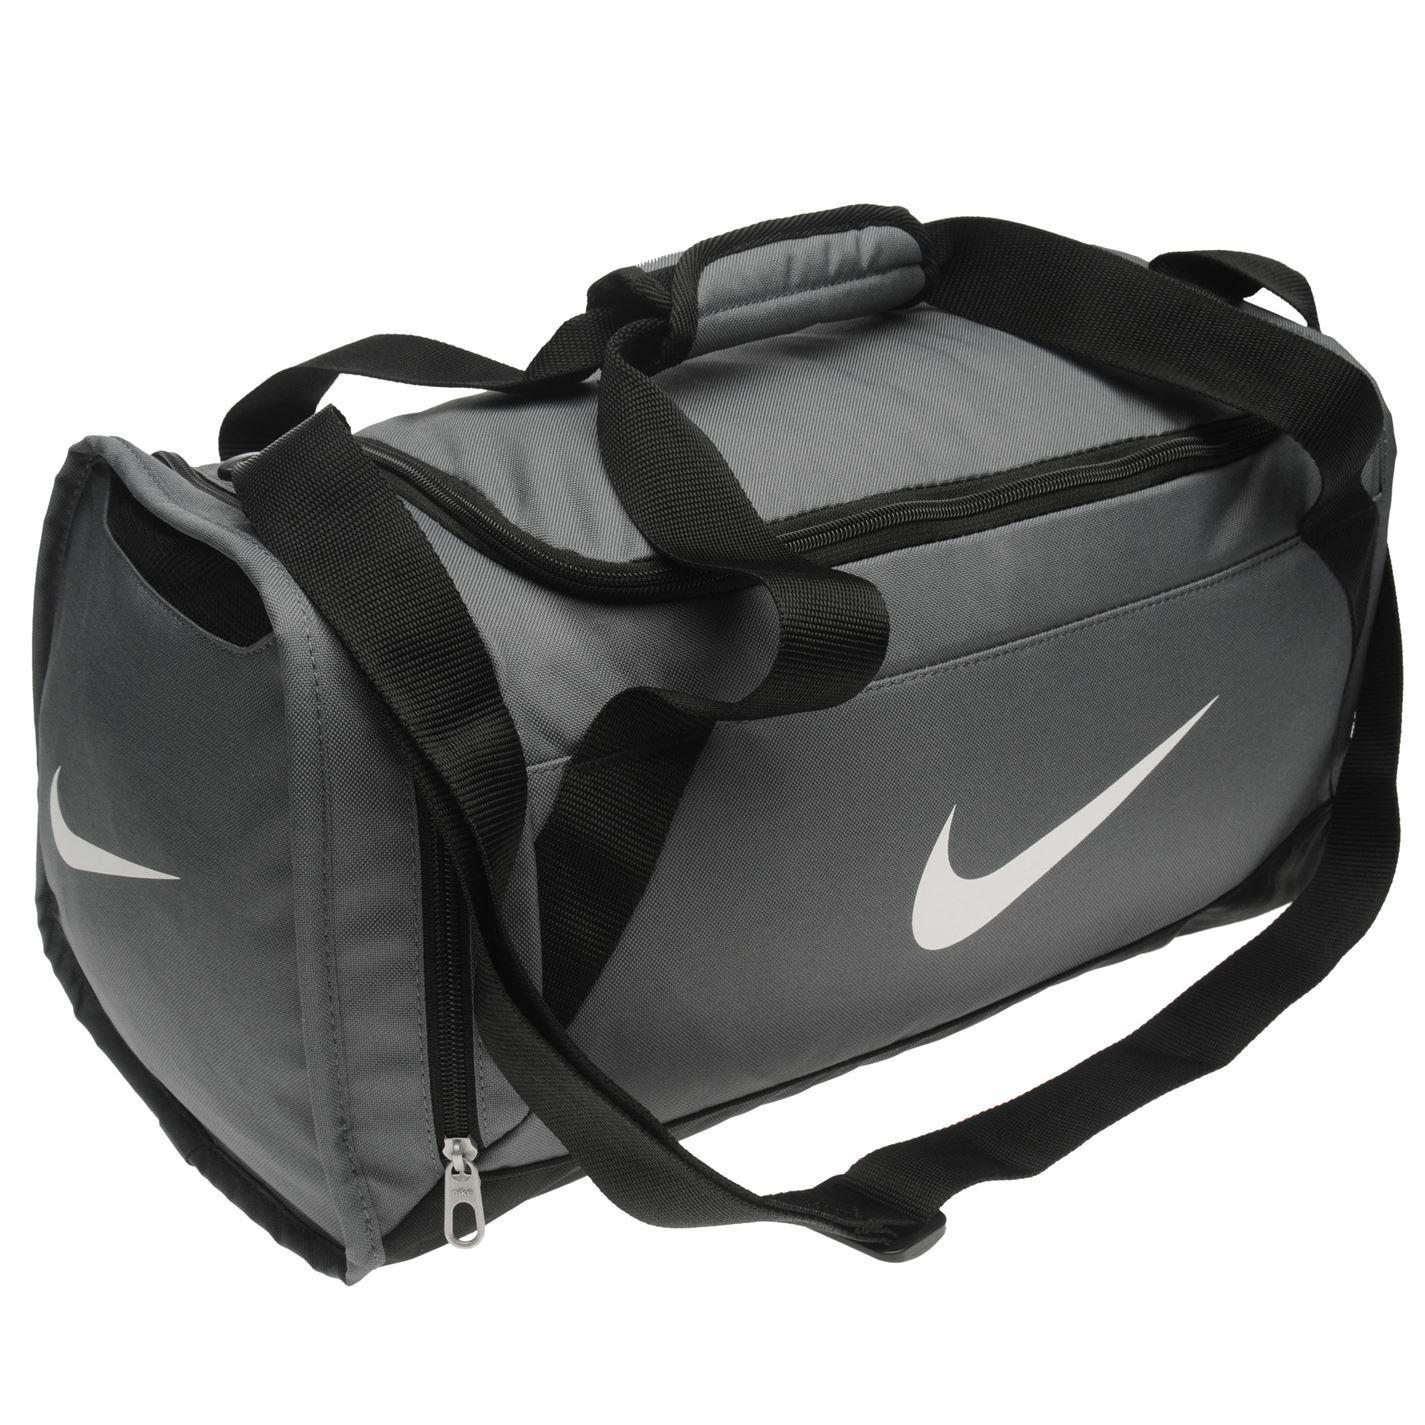 21d95d4afe Nike Brasilia Small Grip Sports Holdall Grey Gym Kit Bag Carryall | eBay